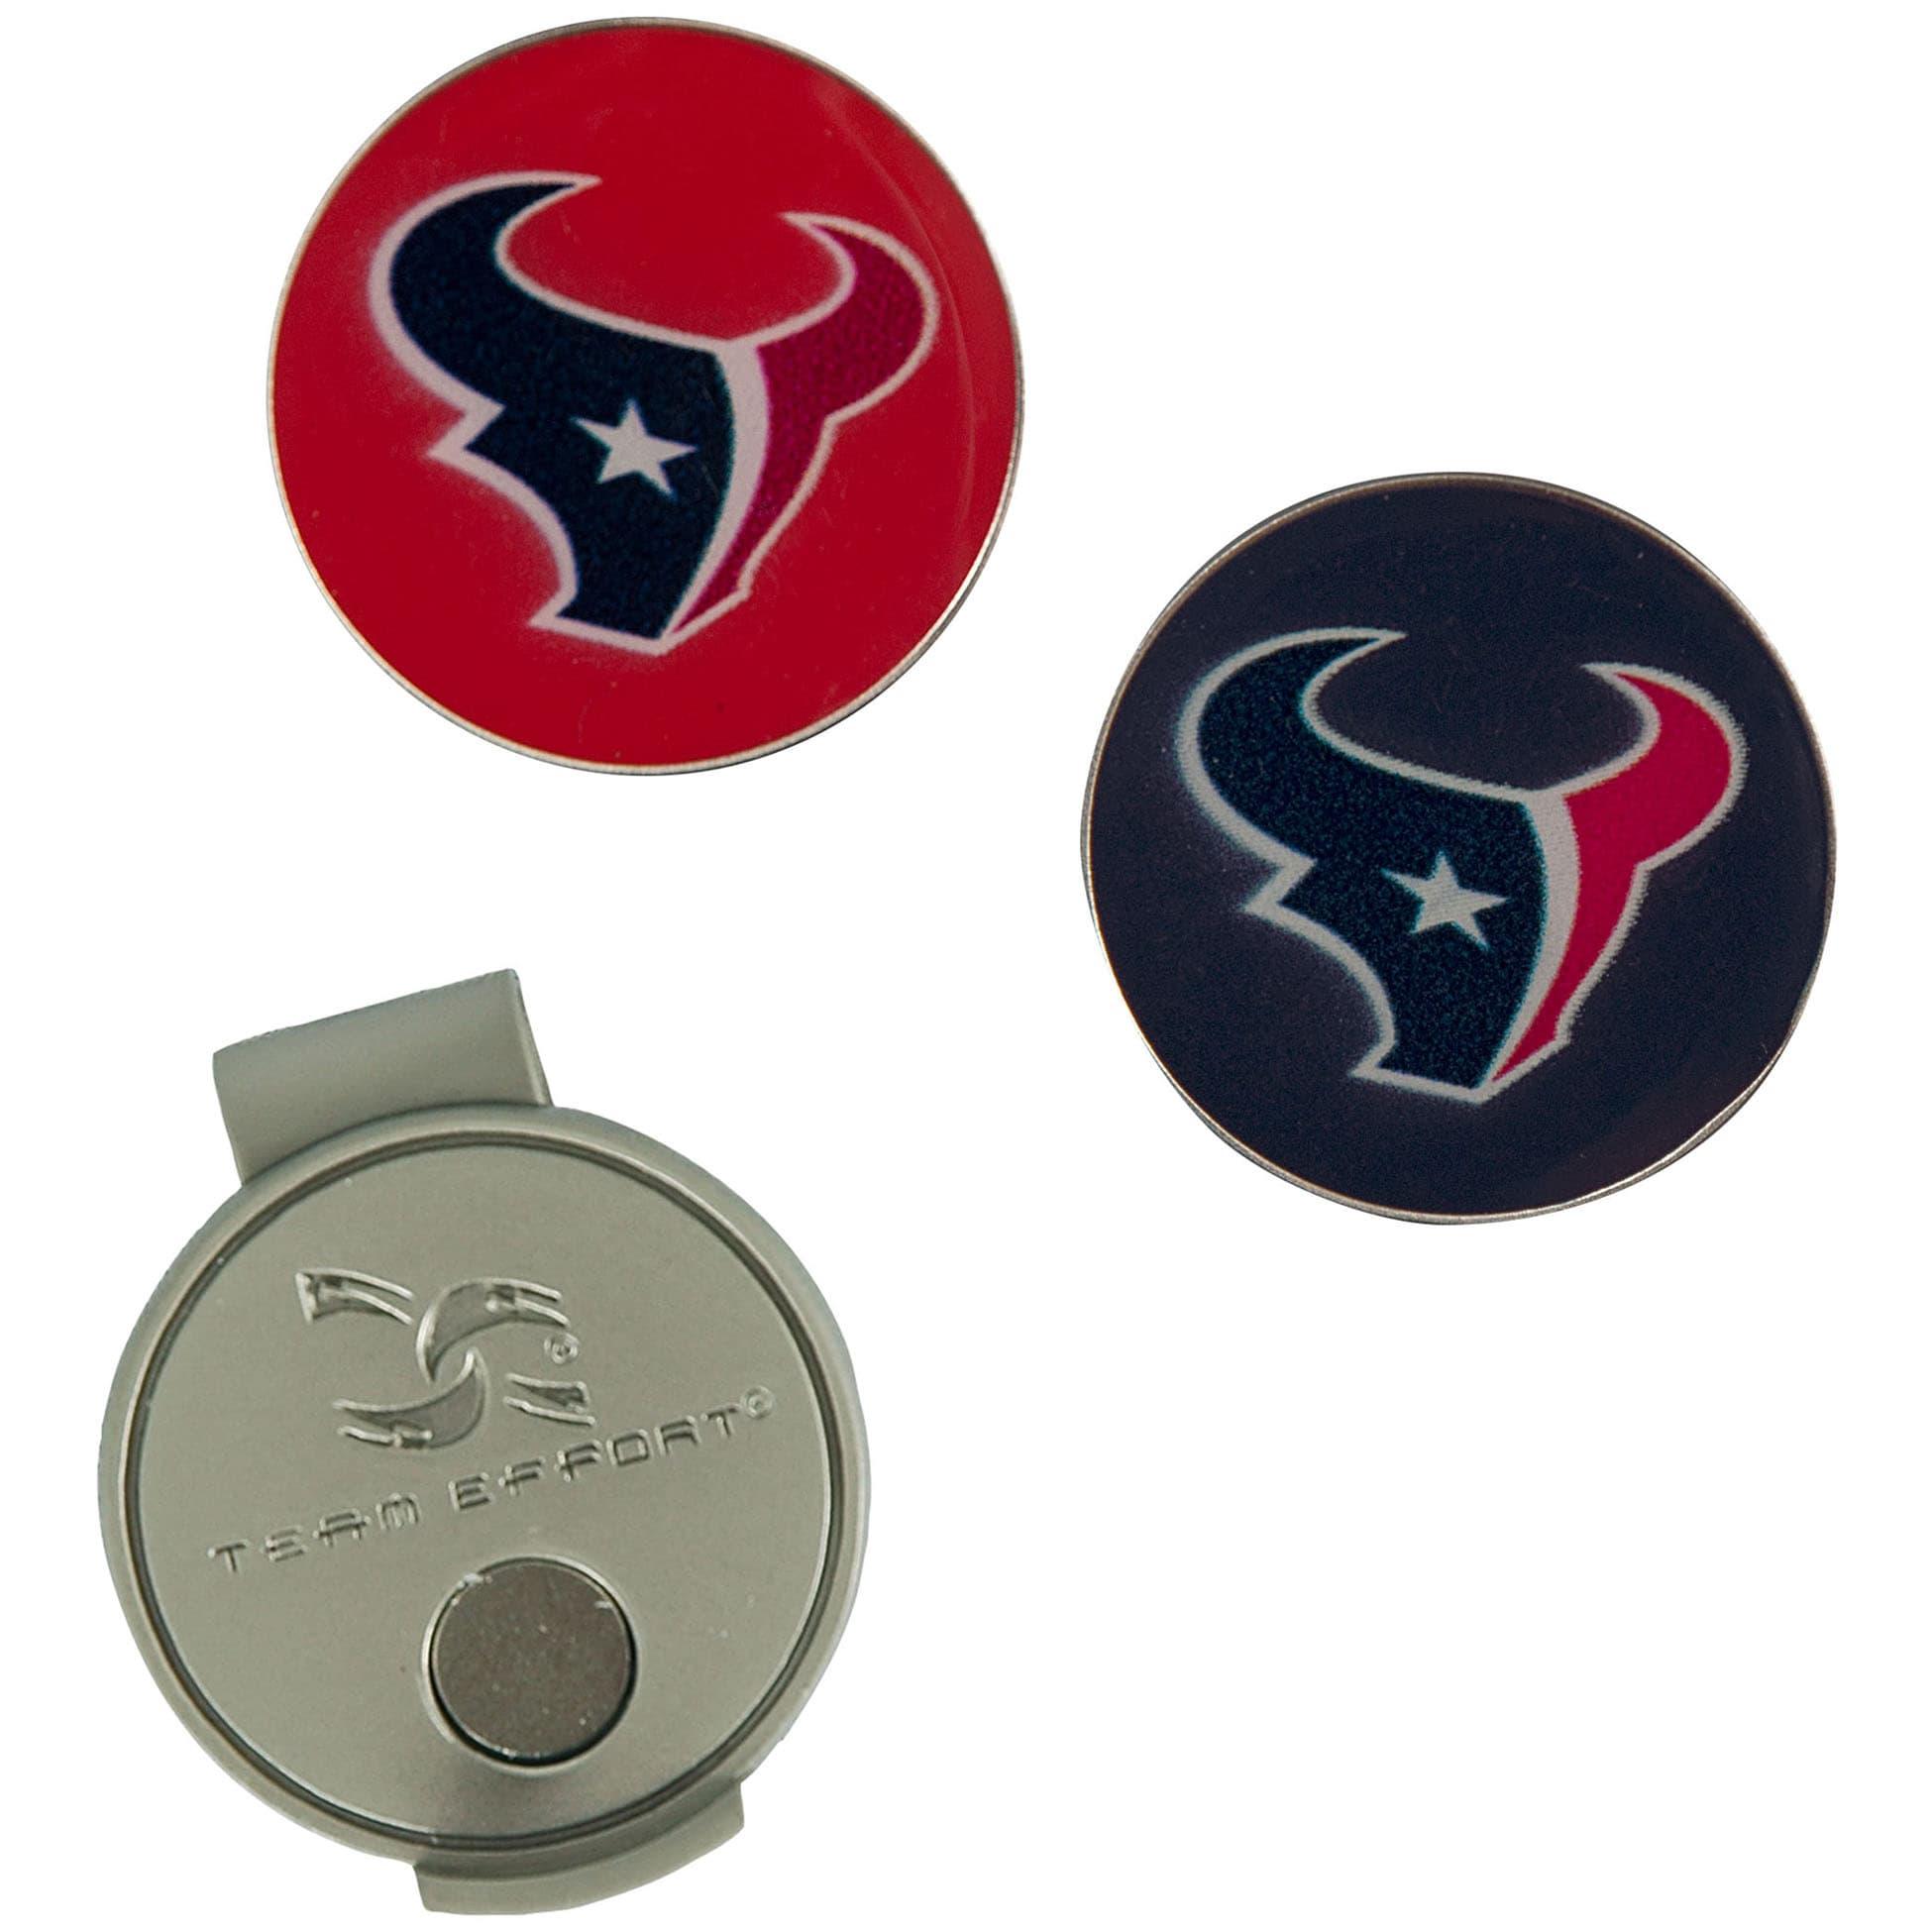 Houston Texans Hat Clip & Ball Markers Set